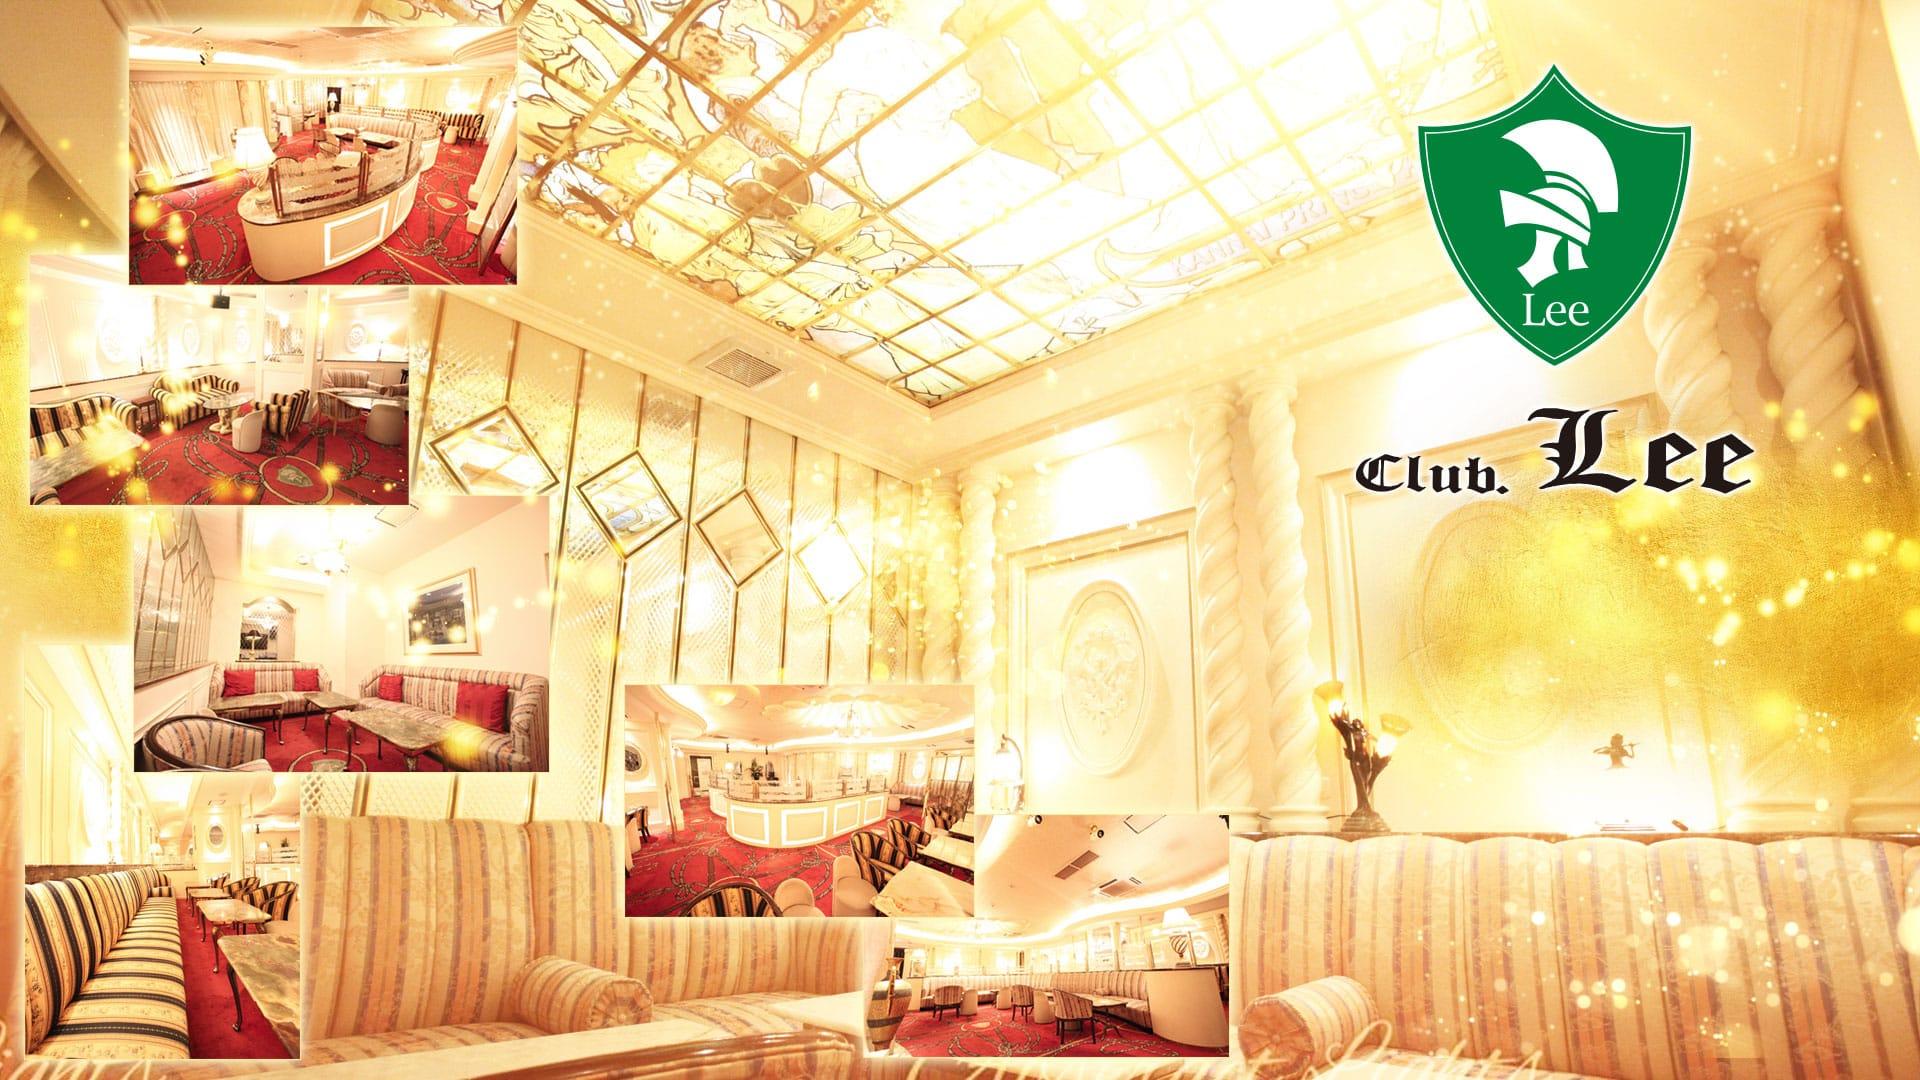 Club Lee[クラブリー] TOP画像